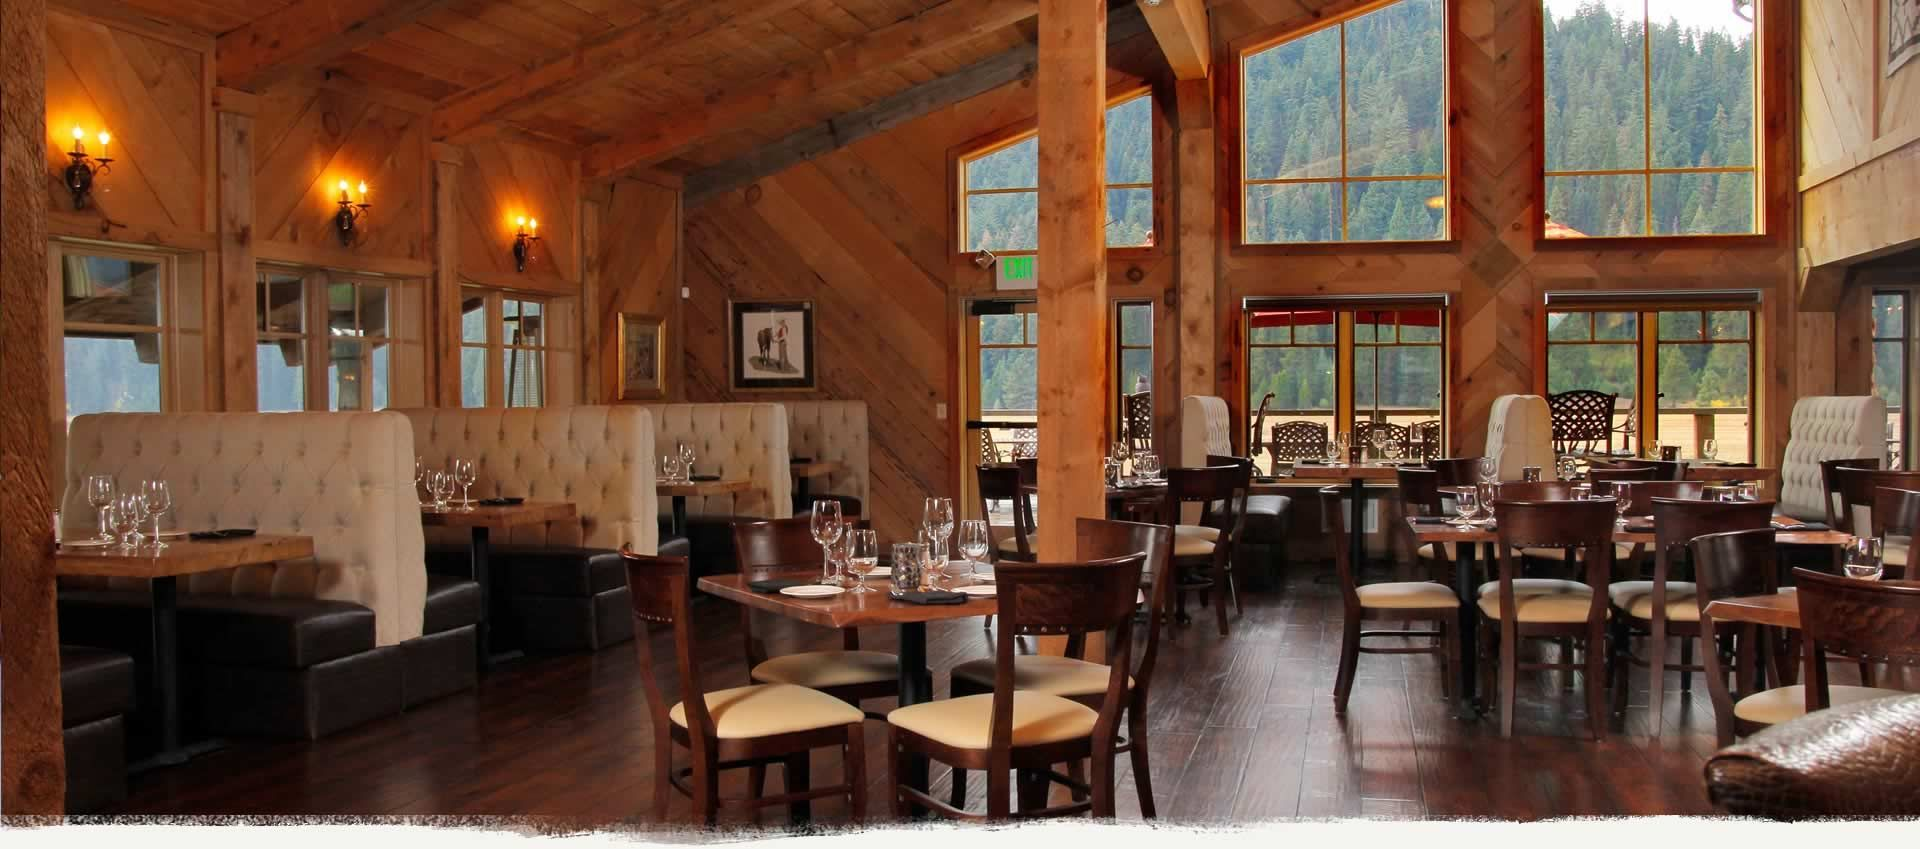 The Highlands Ranch Restaurant And Bar In Len Volcanic National Park Resort Bed Breakfast